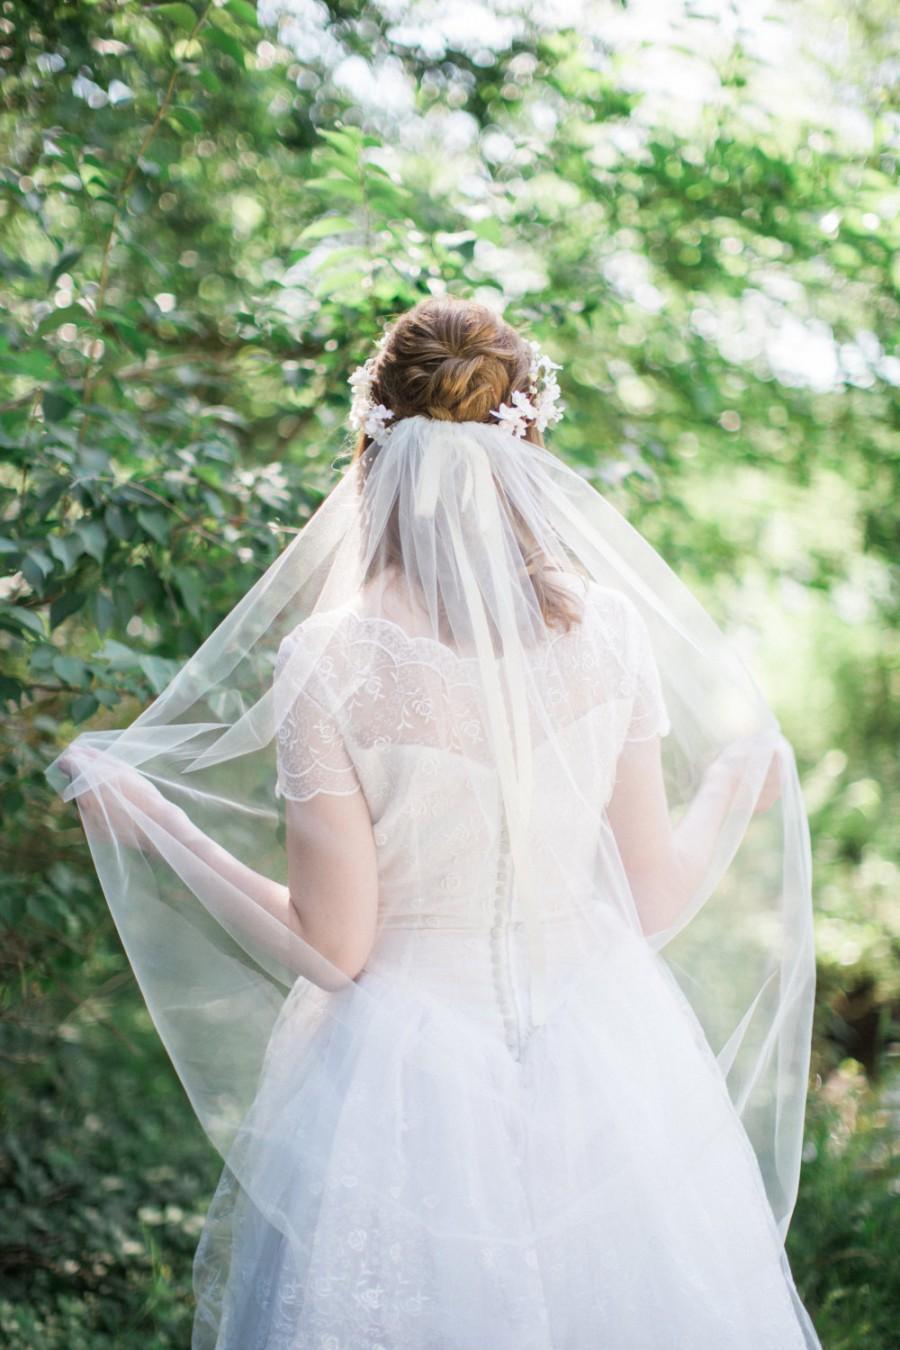 Hochzeit - waltz length veil, waltz veil, bridal veil ivory, bridal veil comb, wedding veil, wedding veil waltz, champagne veil, other color options